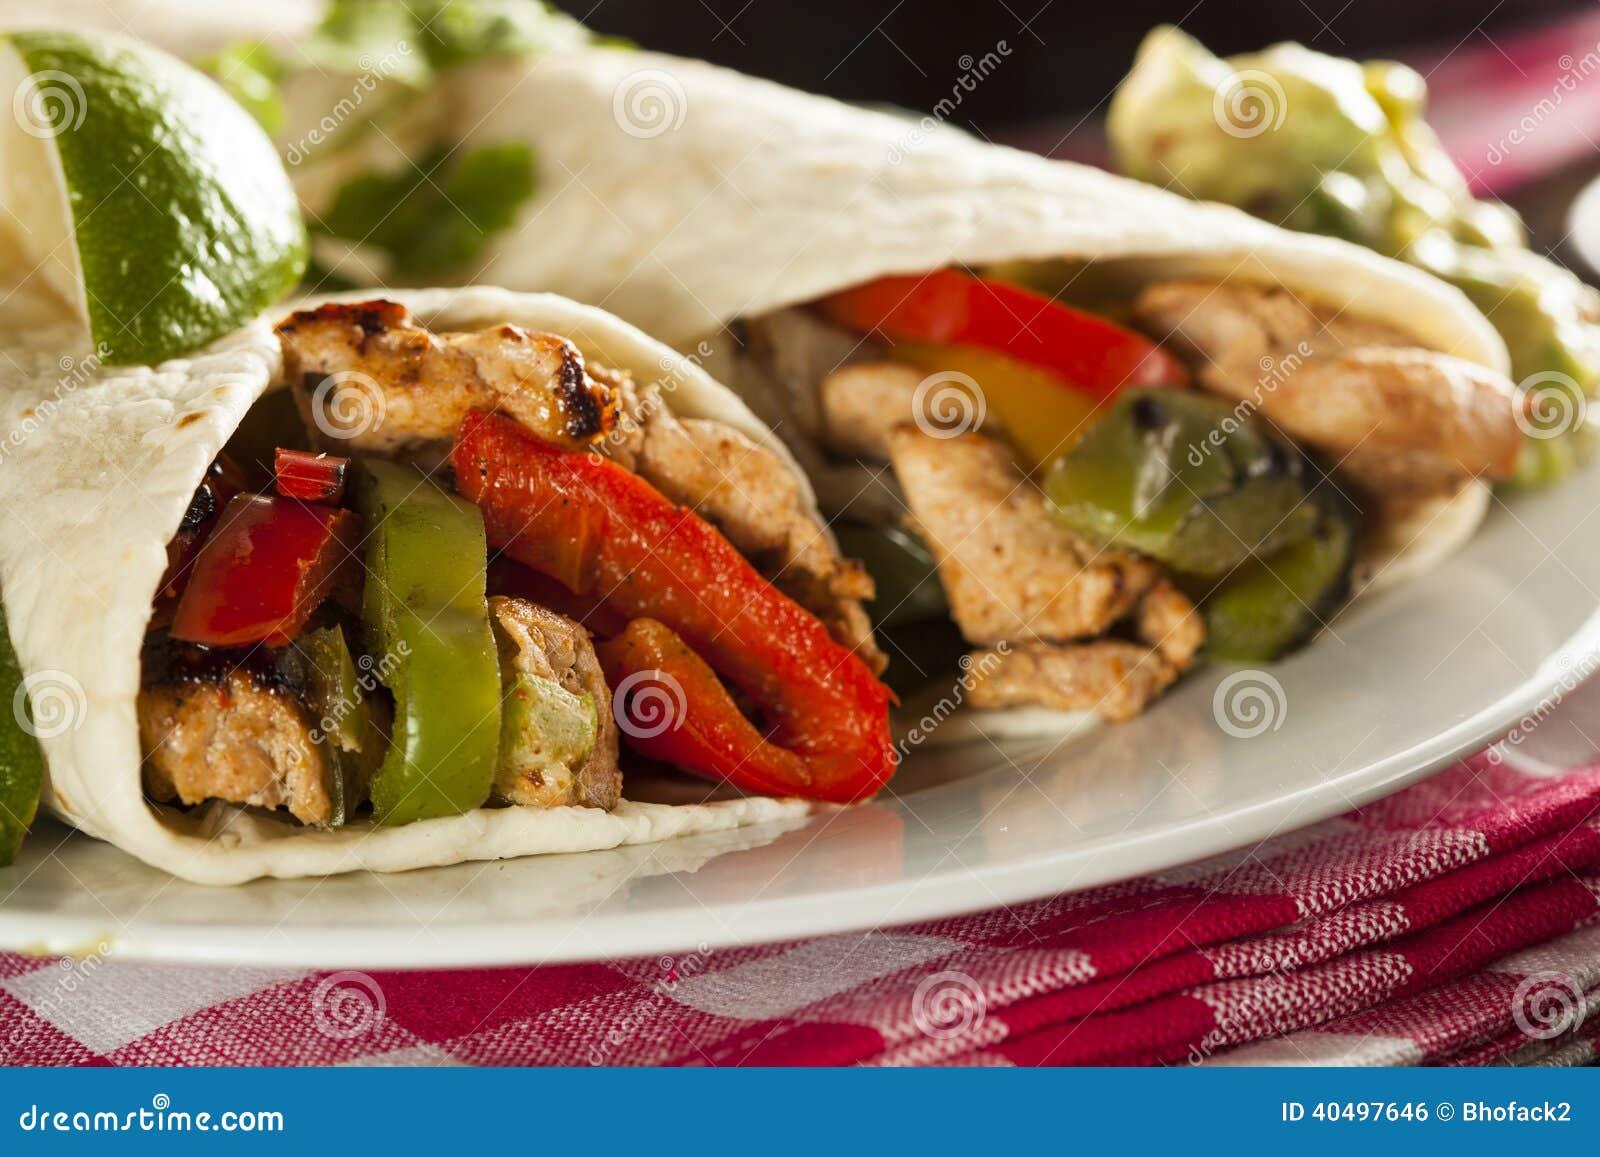 Turkey and pepper fajitas forecasting